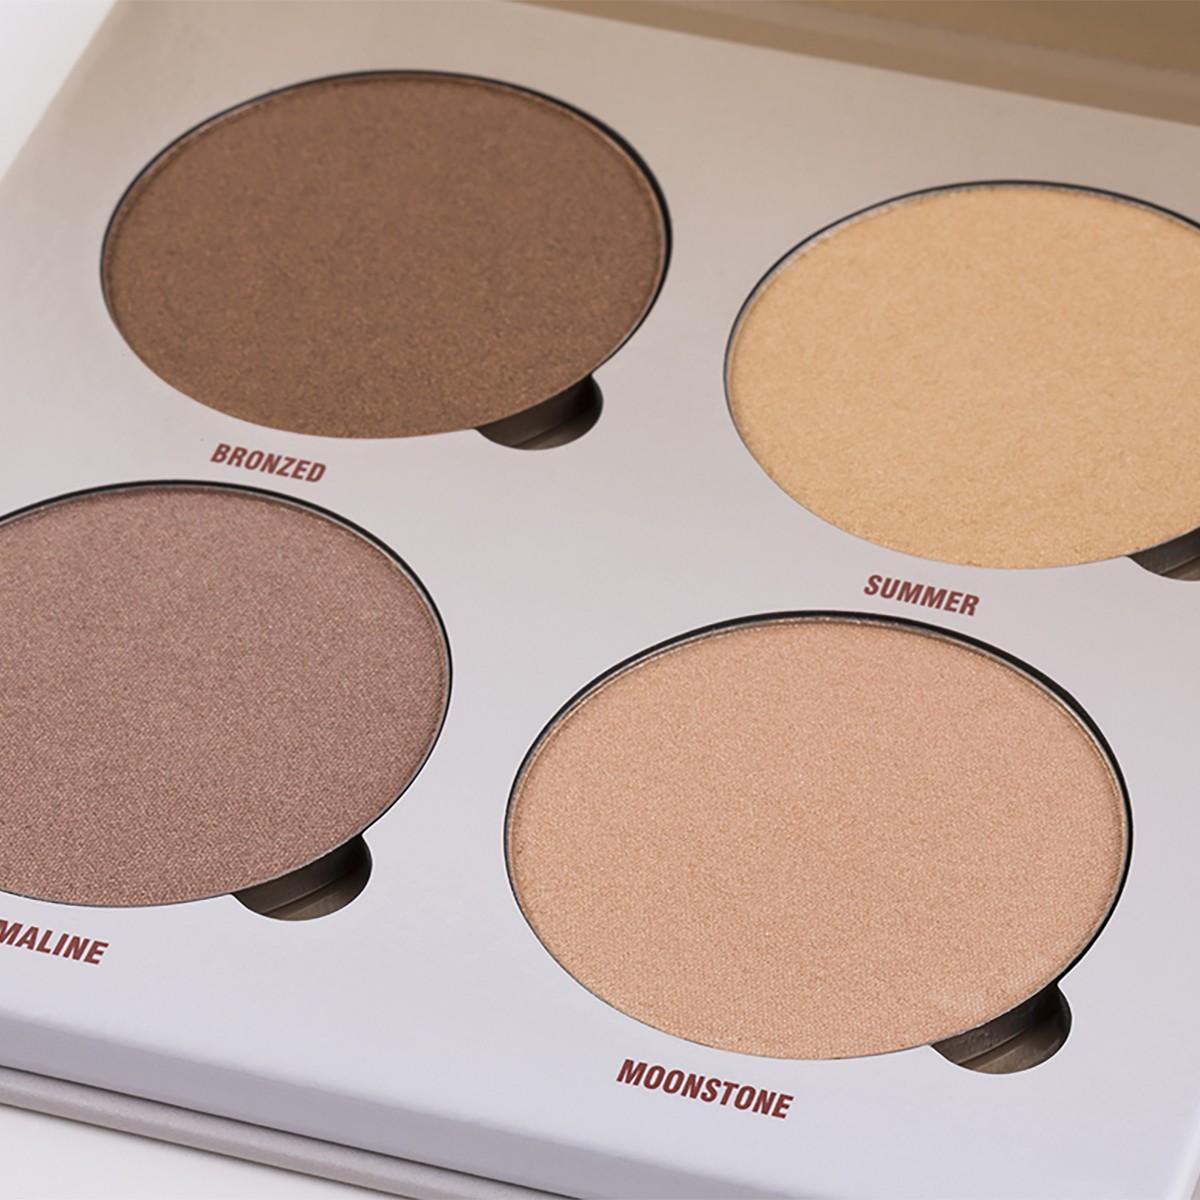 Anastasia Beverly Hills Sun Dipped Glow Kit | Beautylish